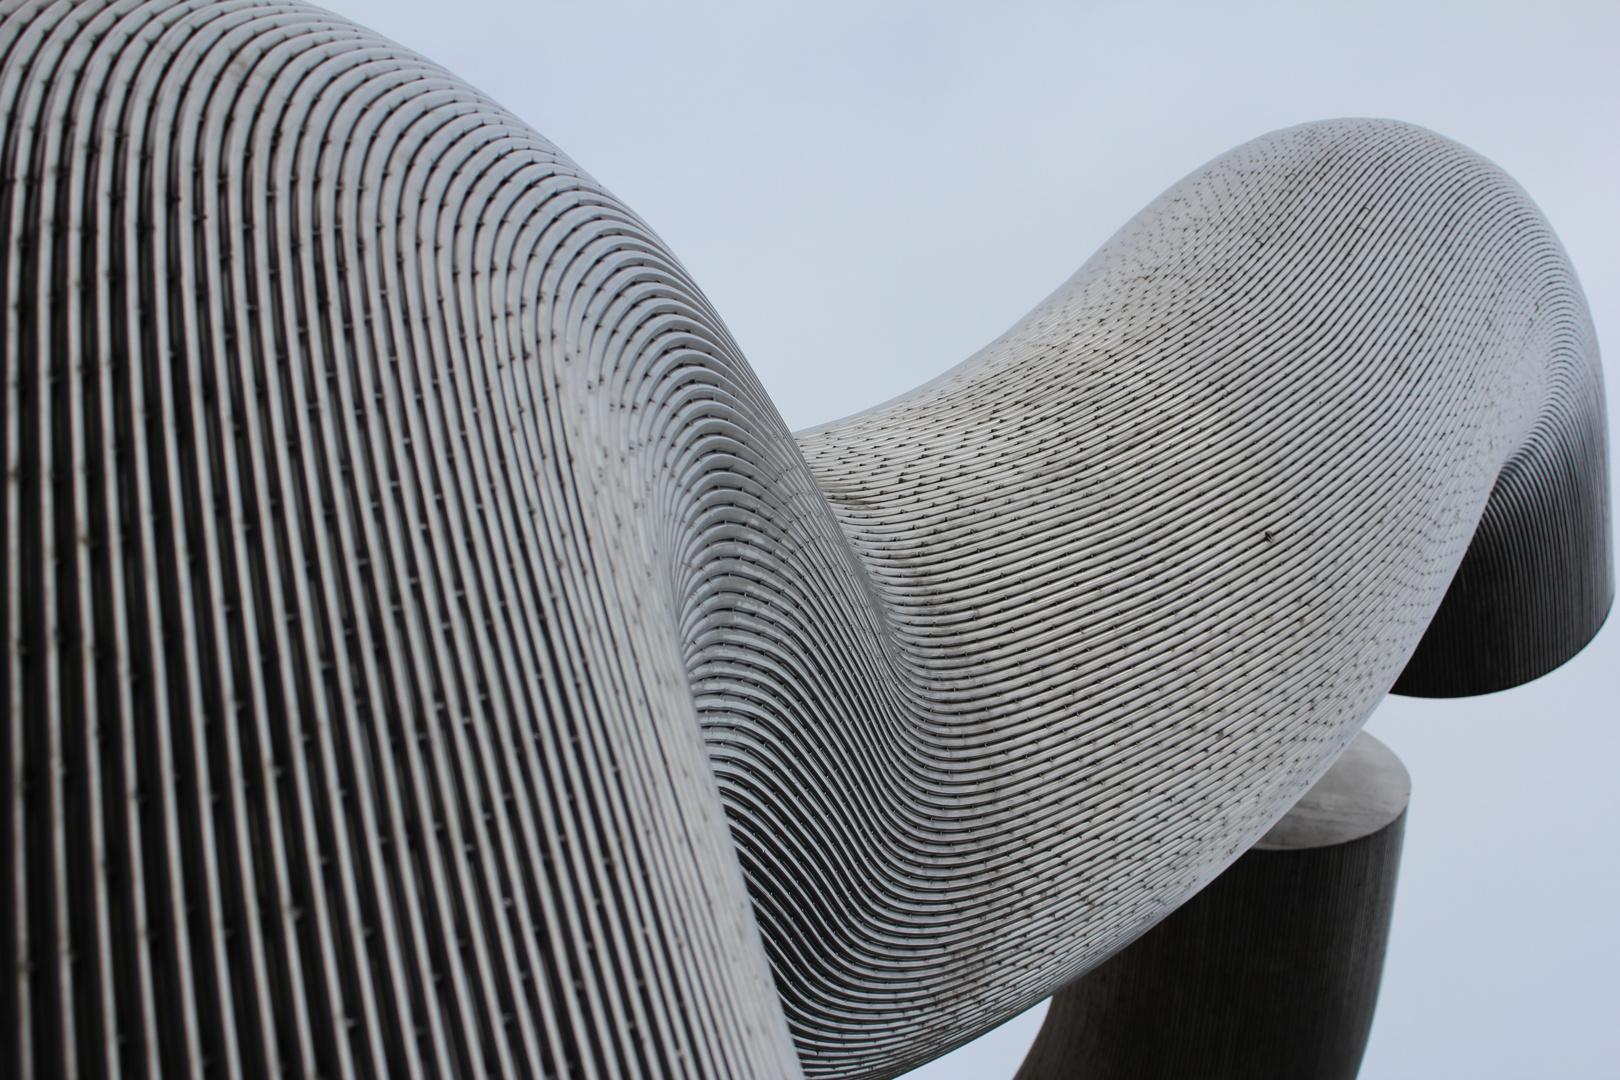 Skulptur aus anderem Winkel